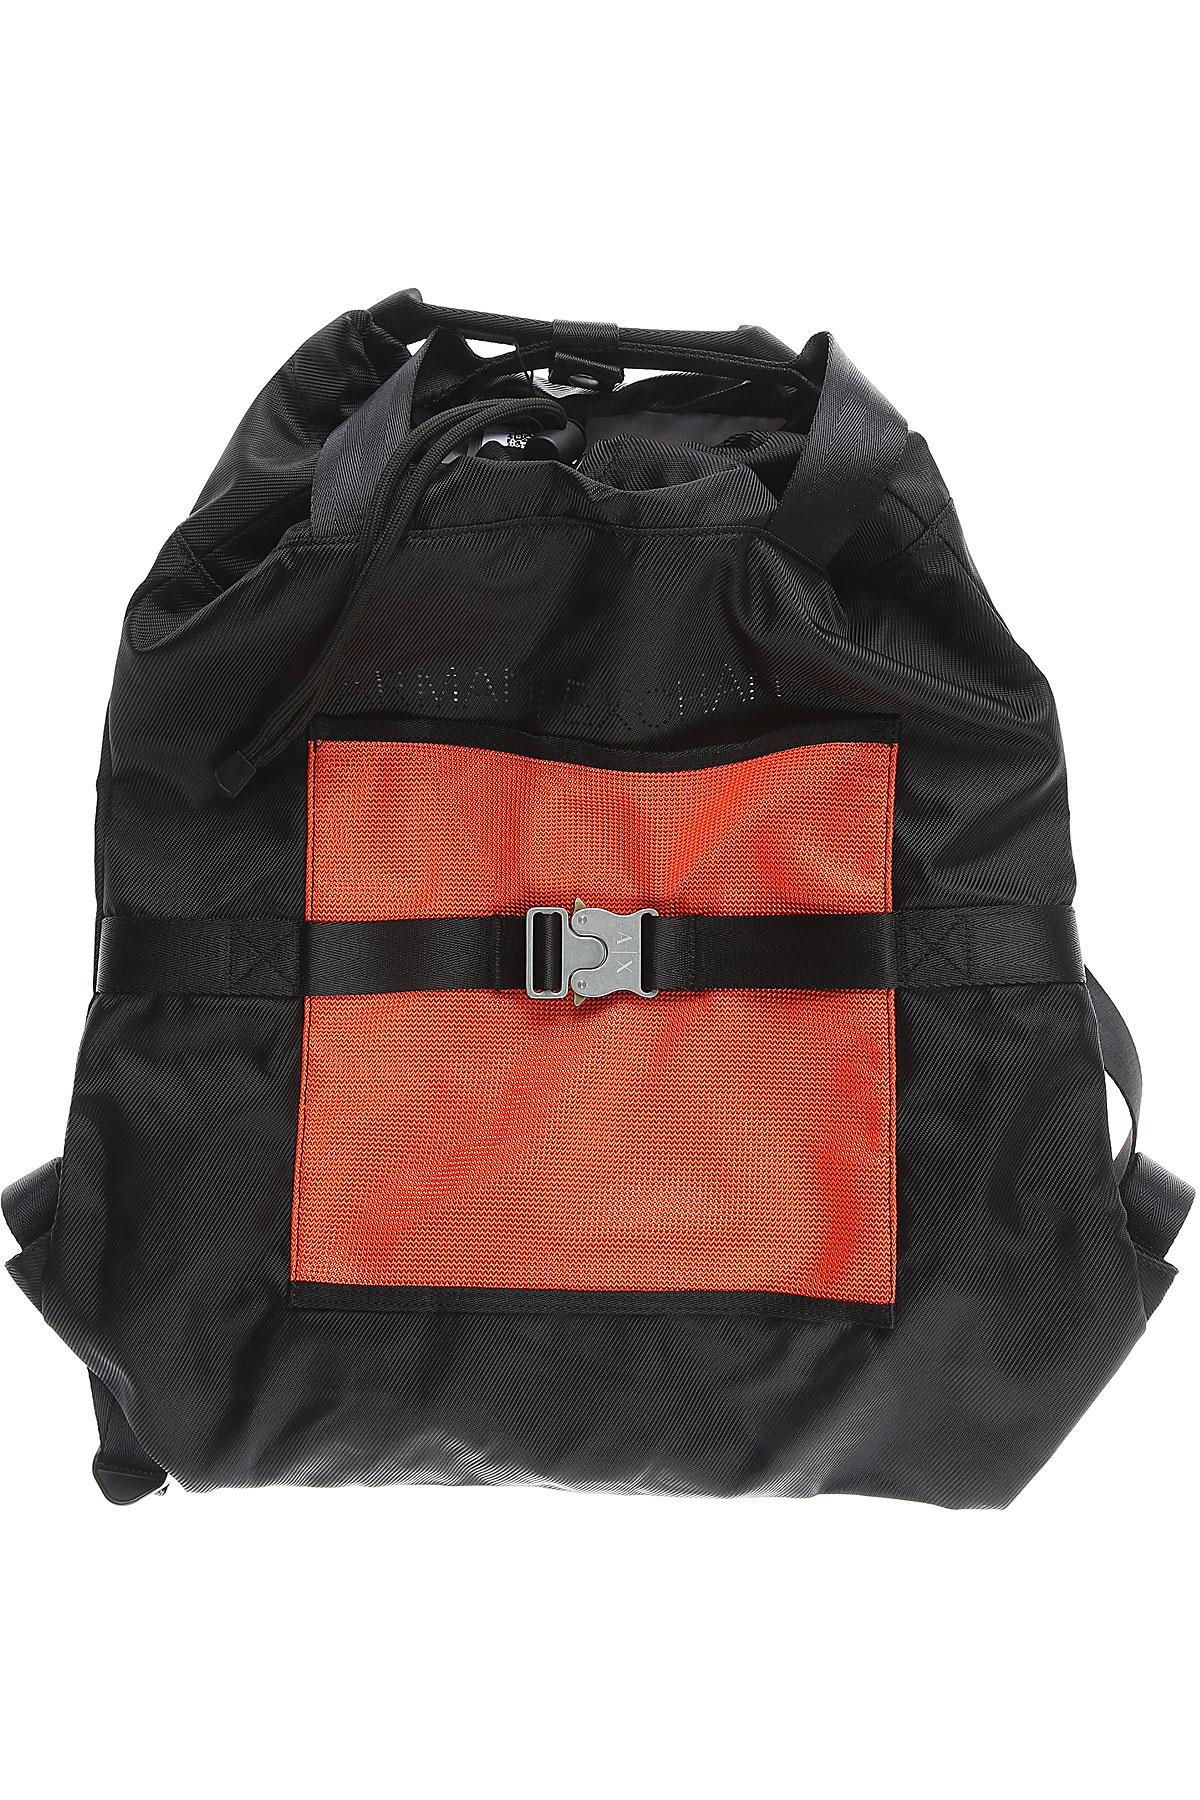 Armani Exchange Backpack for Men On Sale in Outlet, Black, polyester, 2019